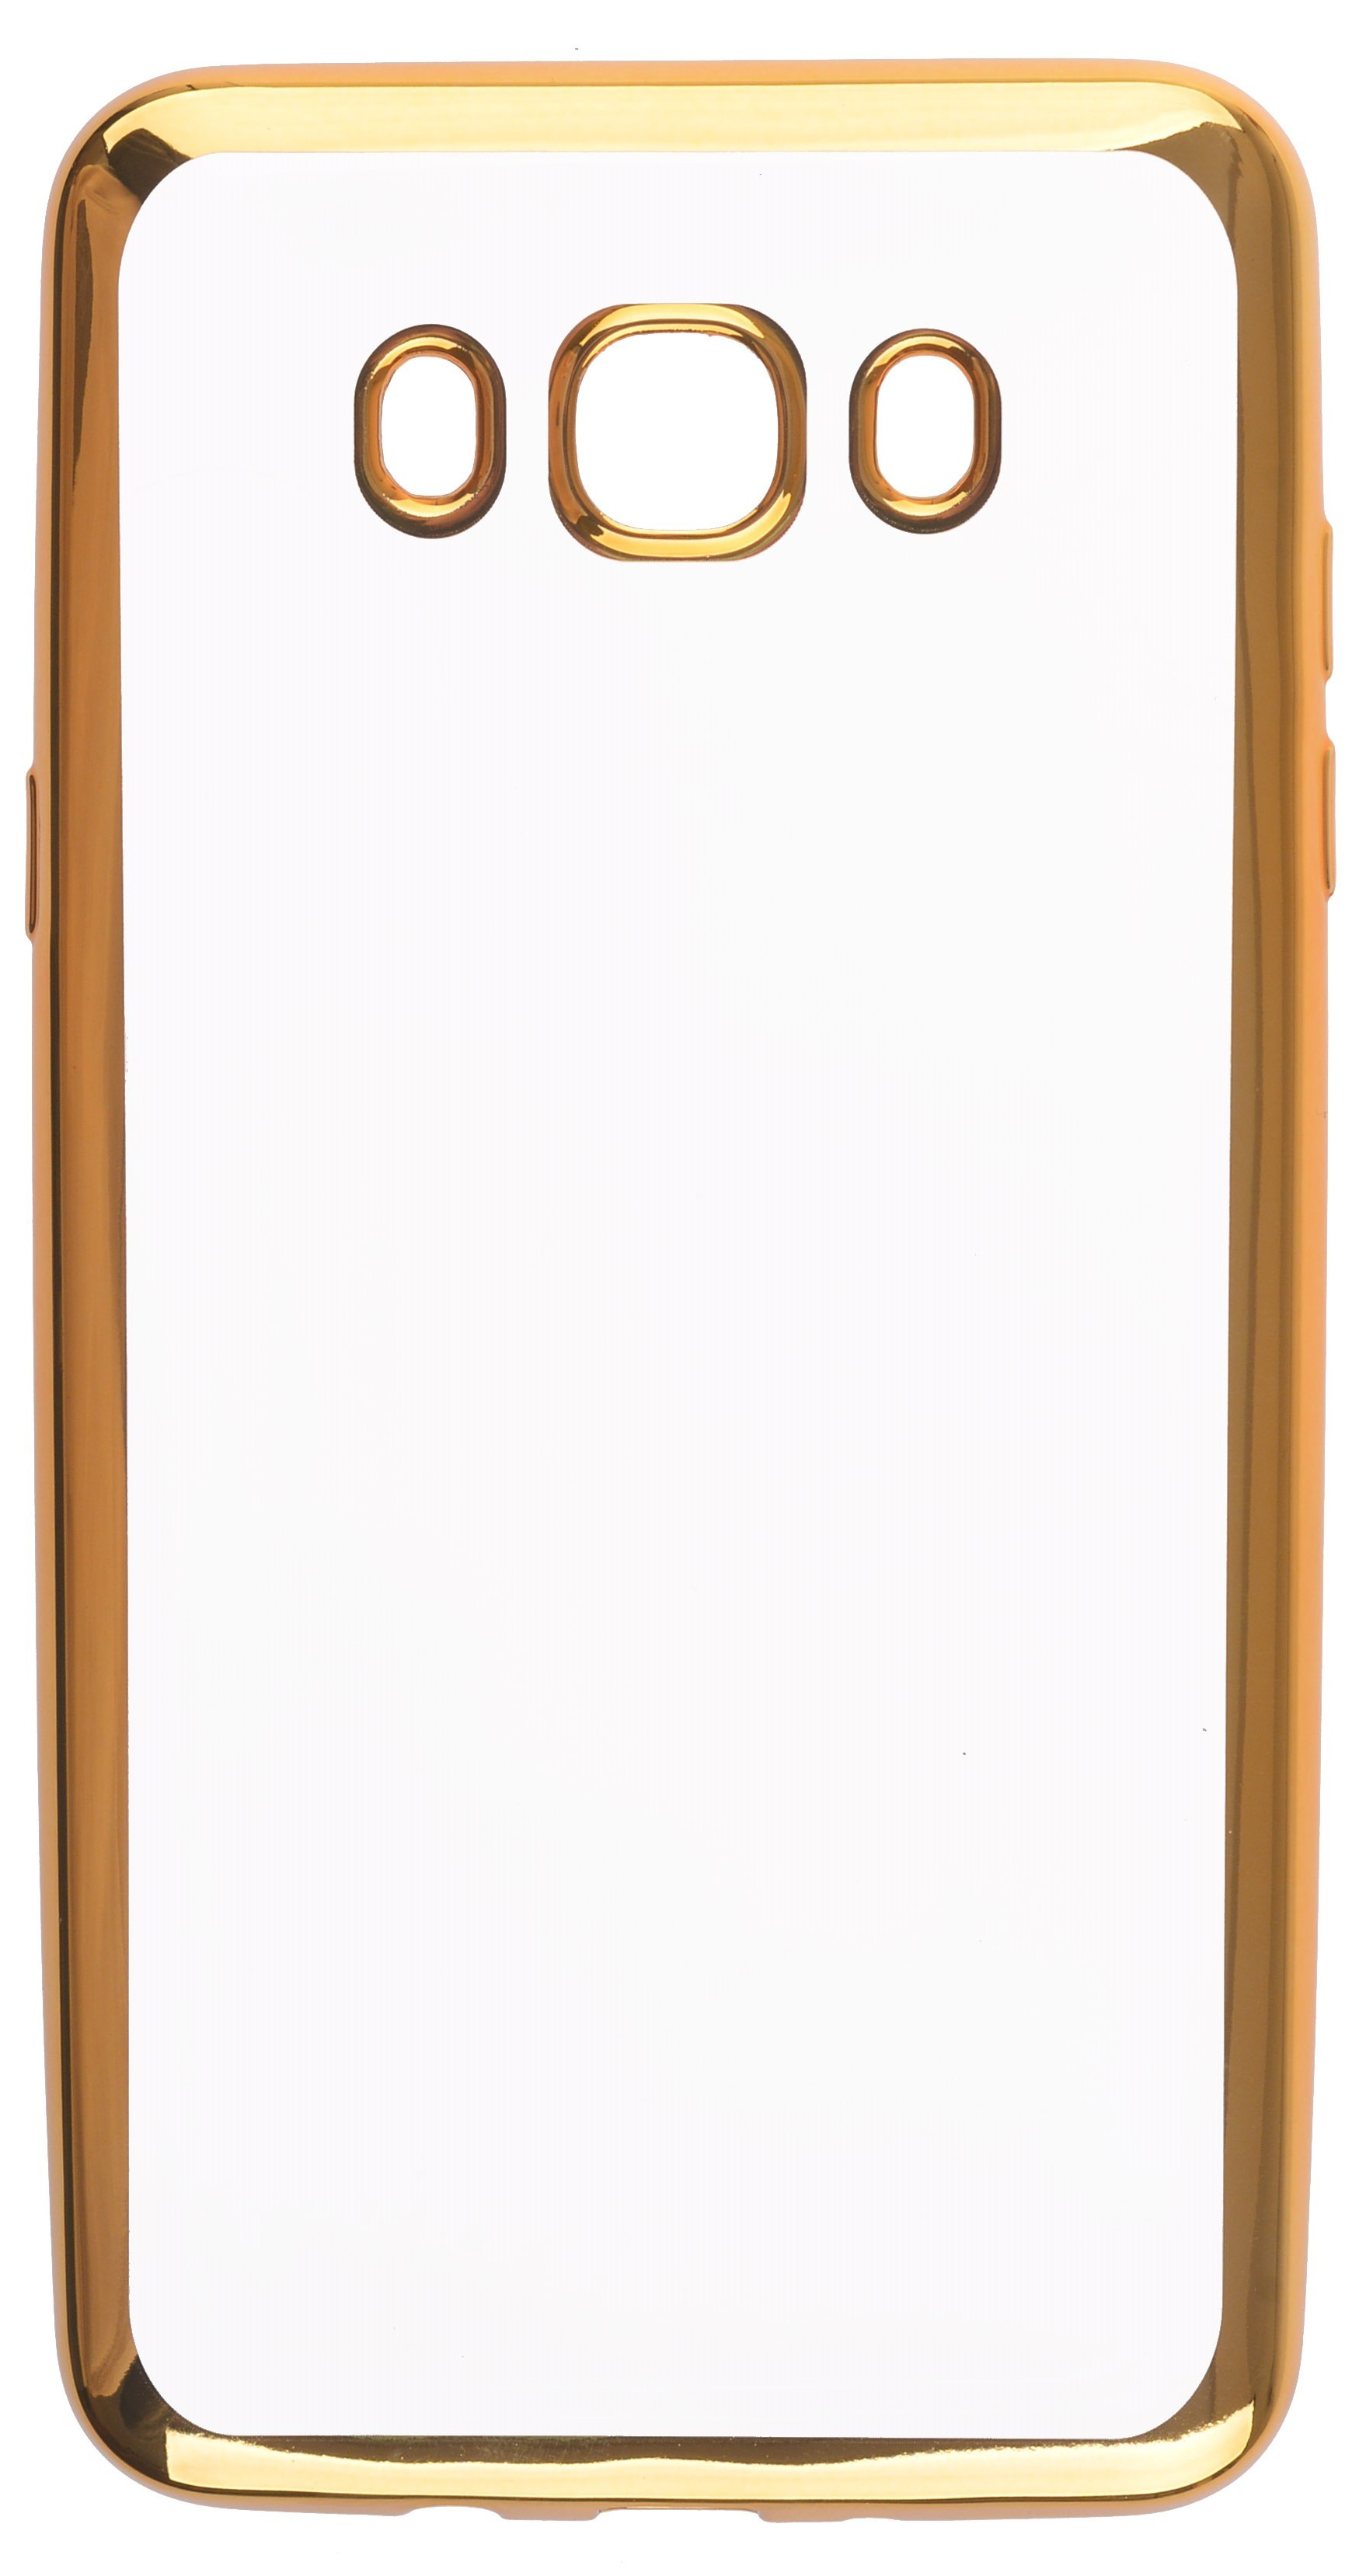 Чехол для сотового телефона skinBOX Silicone chrome border, 4660041407945, золотой skinbox 4people slim silicone чехол накладка для xiaomi redmi 4a transparent